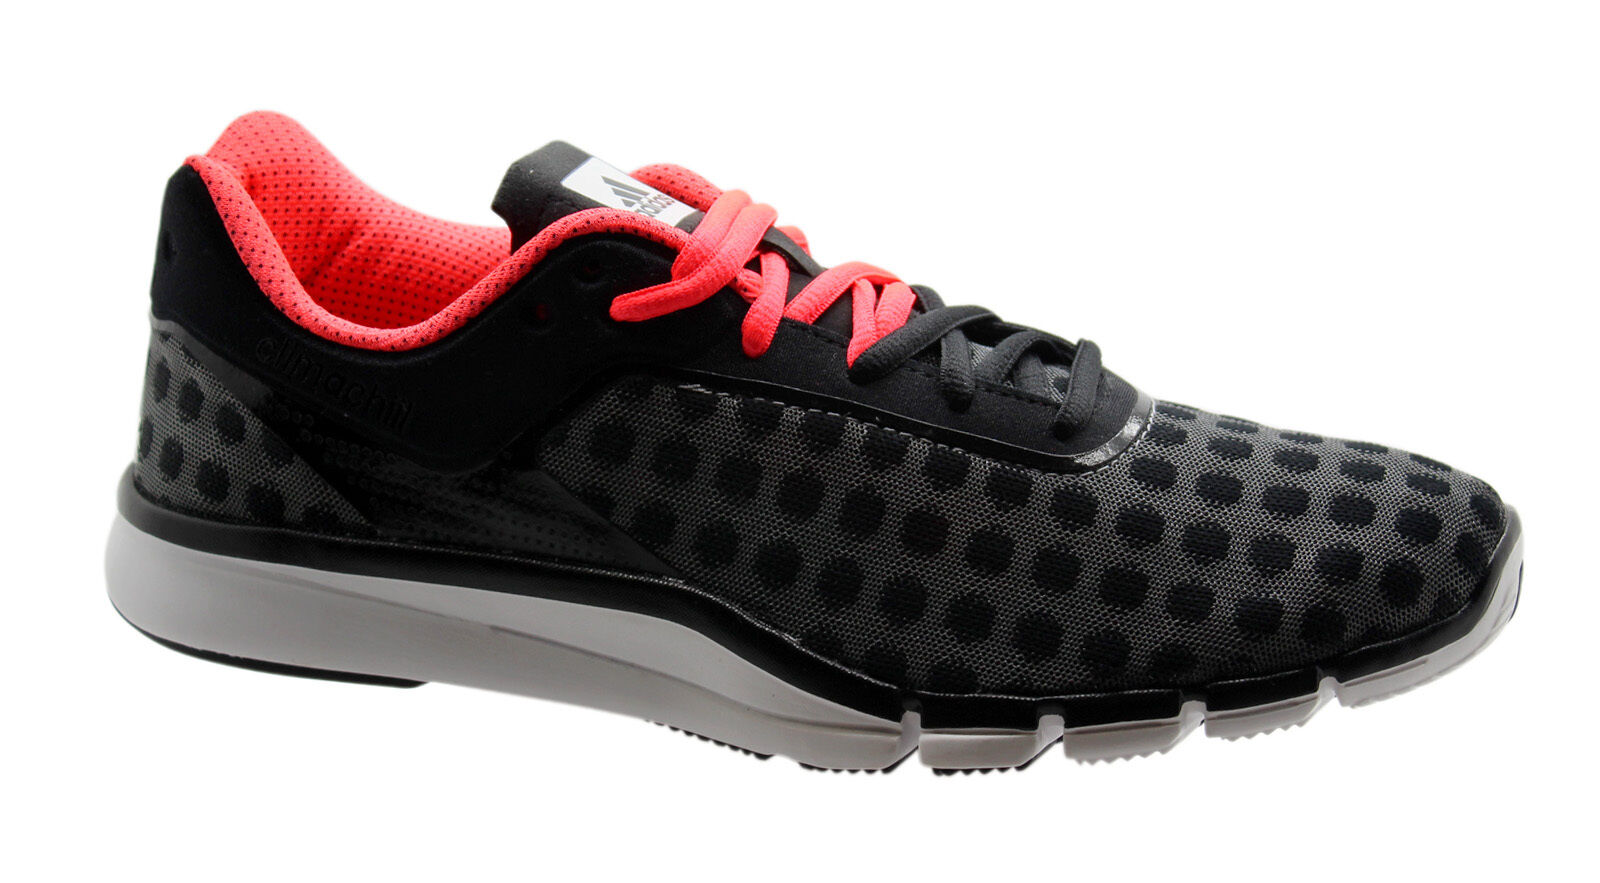 Adidas Sports Performance Adipure 360.2 Chill Mens Running Shoes B40272 U84 Seasonal clearance sale